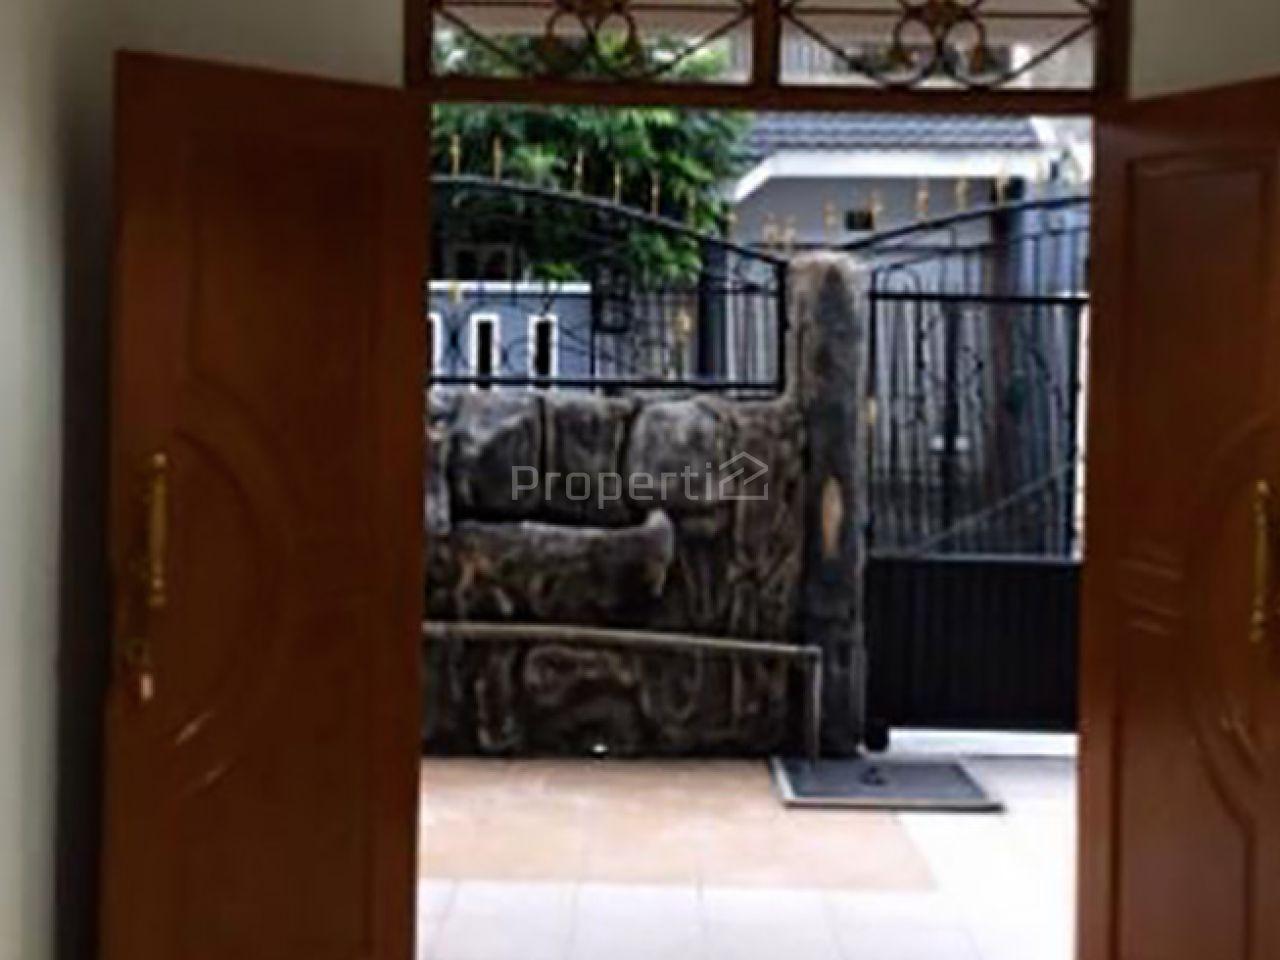 2-Storey House in Strategic Housing Around Tomang, DKI Jakarta